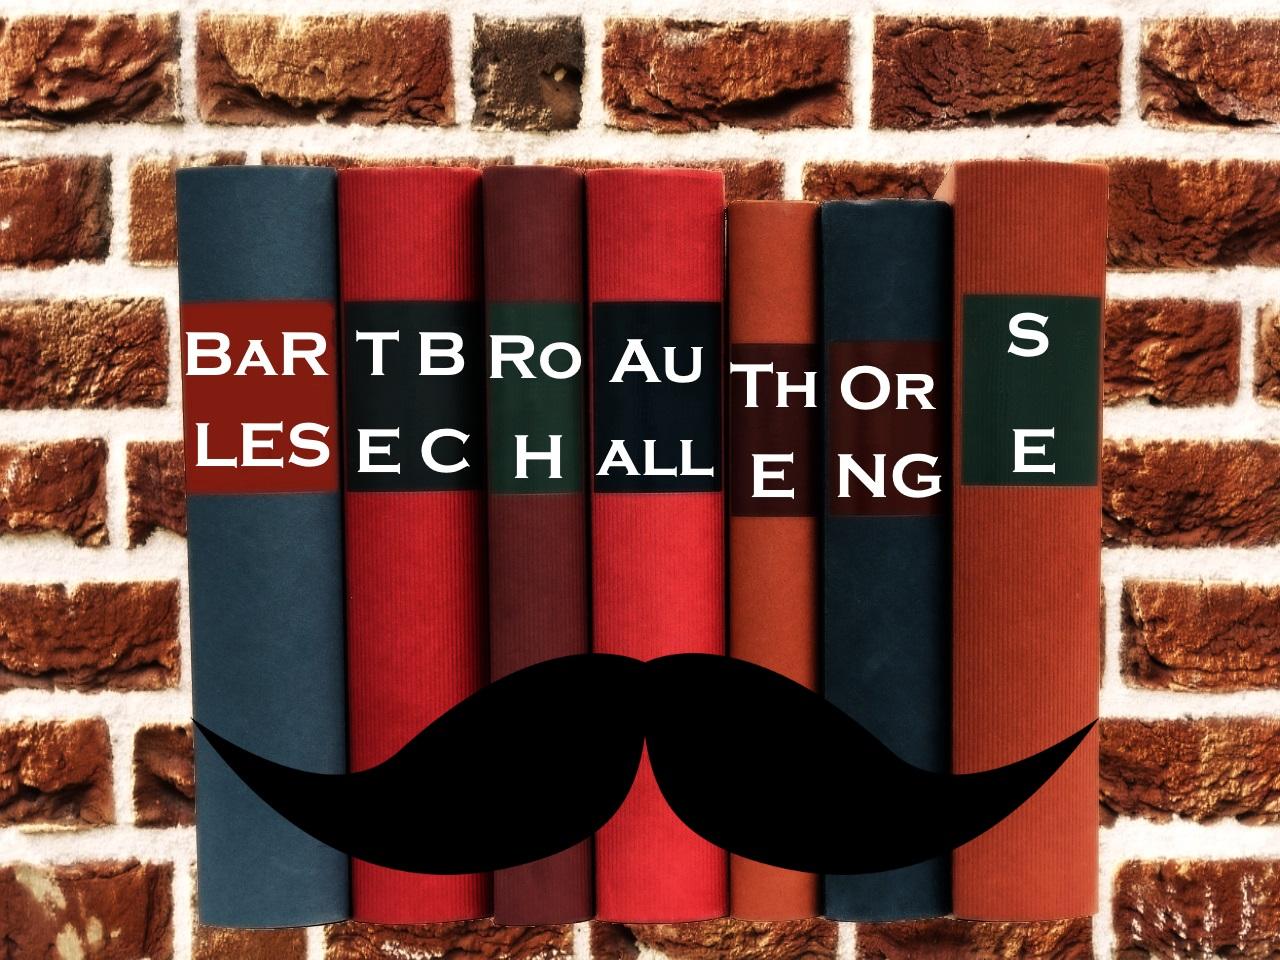 Die BartBroAuthors-Lesechallenge